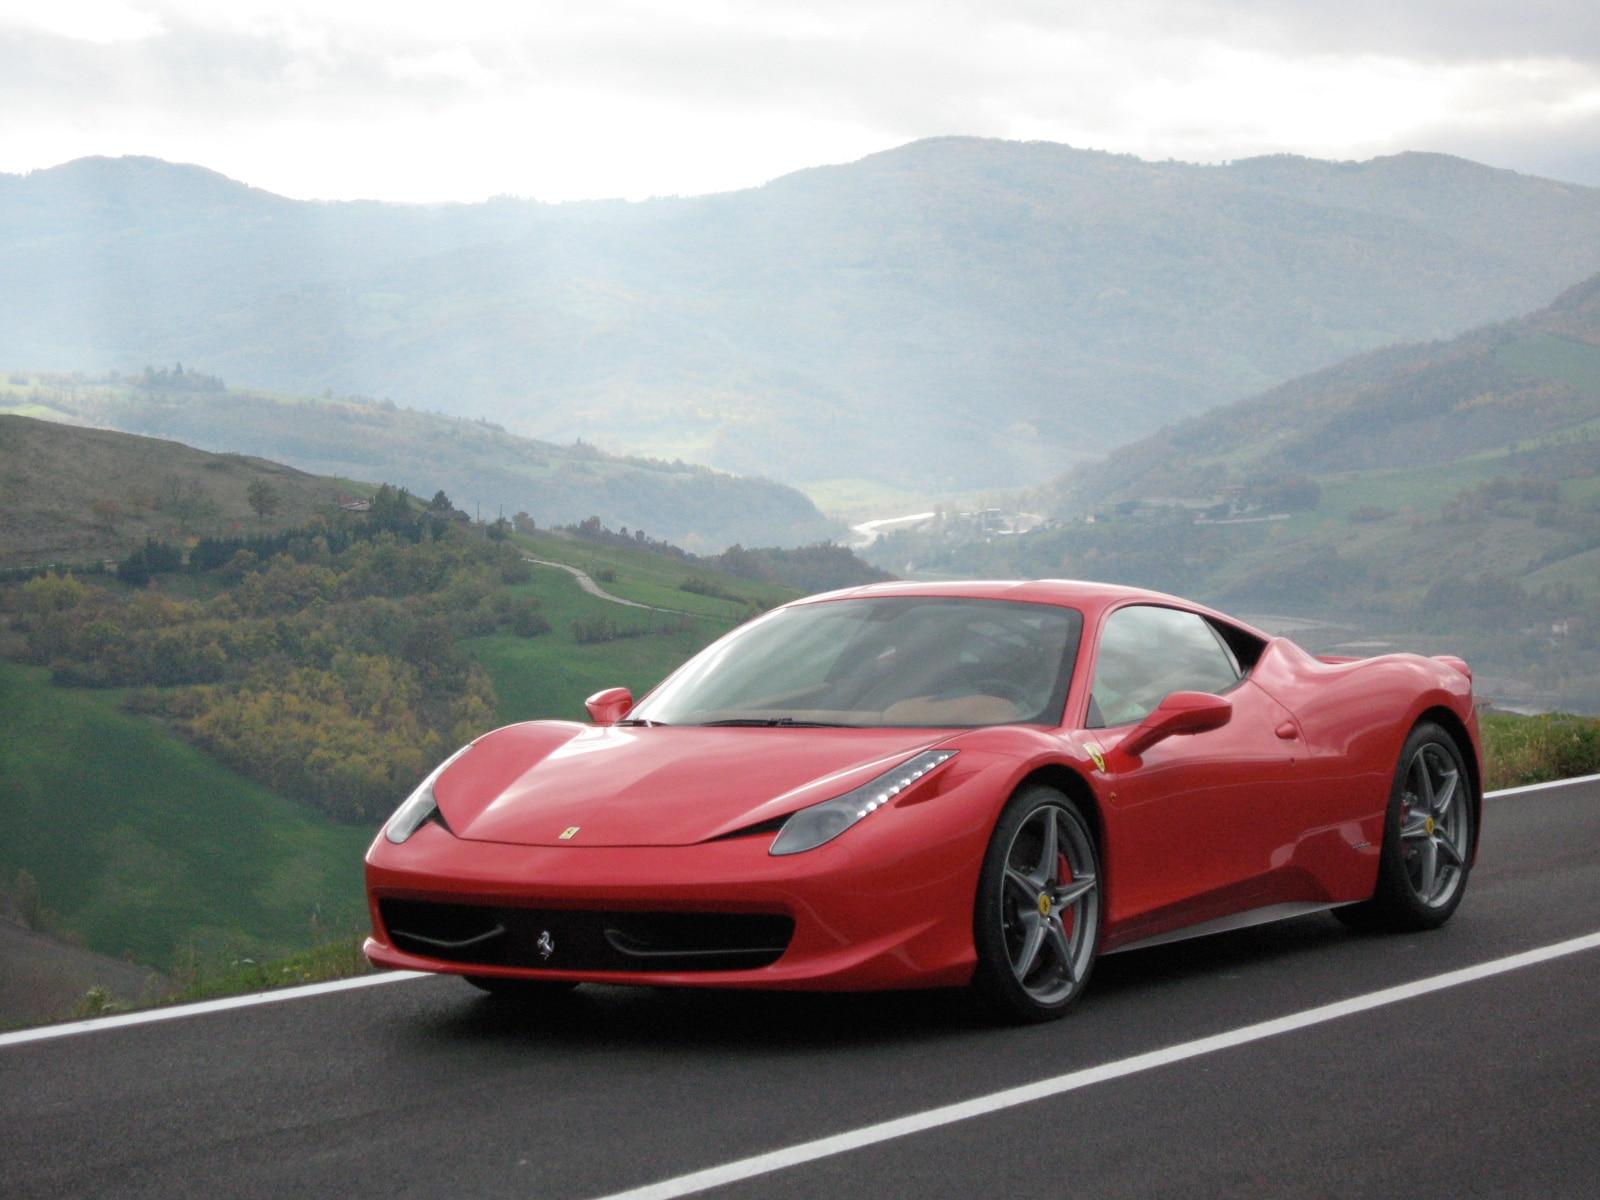 0911 02 Z 2010 Ferrari 458 Italia Front Three Quarter View